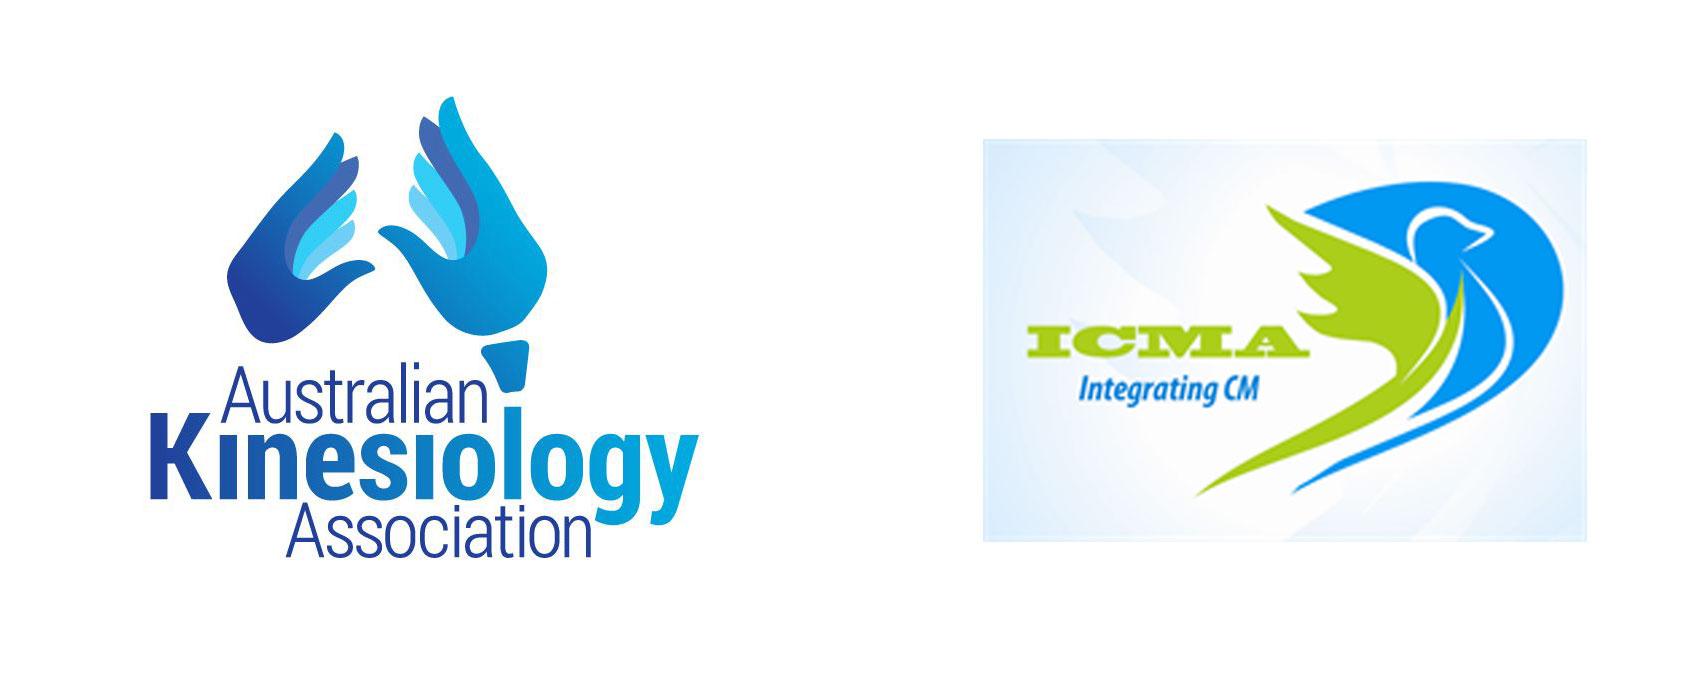 Australian Kinesiology Association Logo